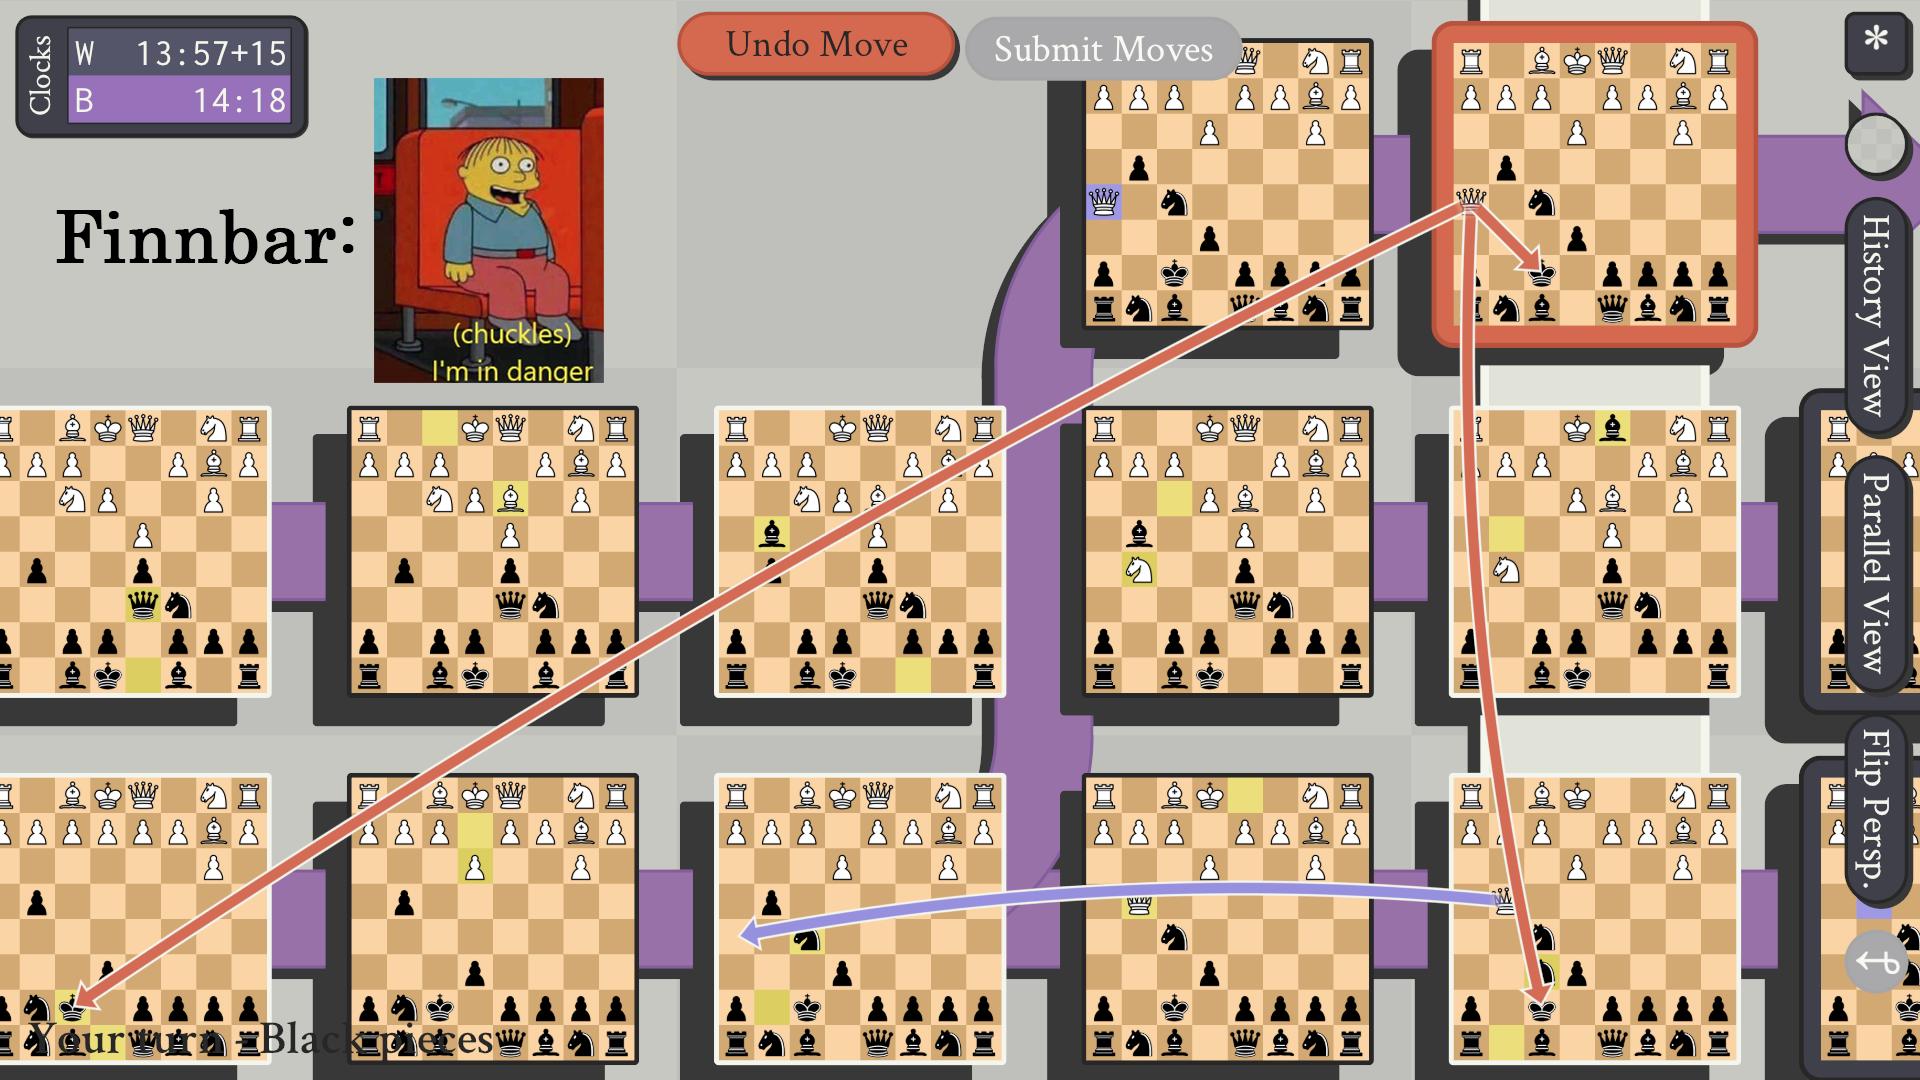 5d chess journey pt 4 finnbar's struggle